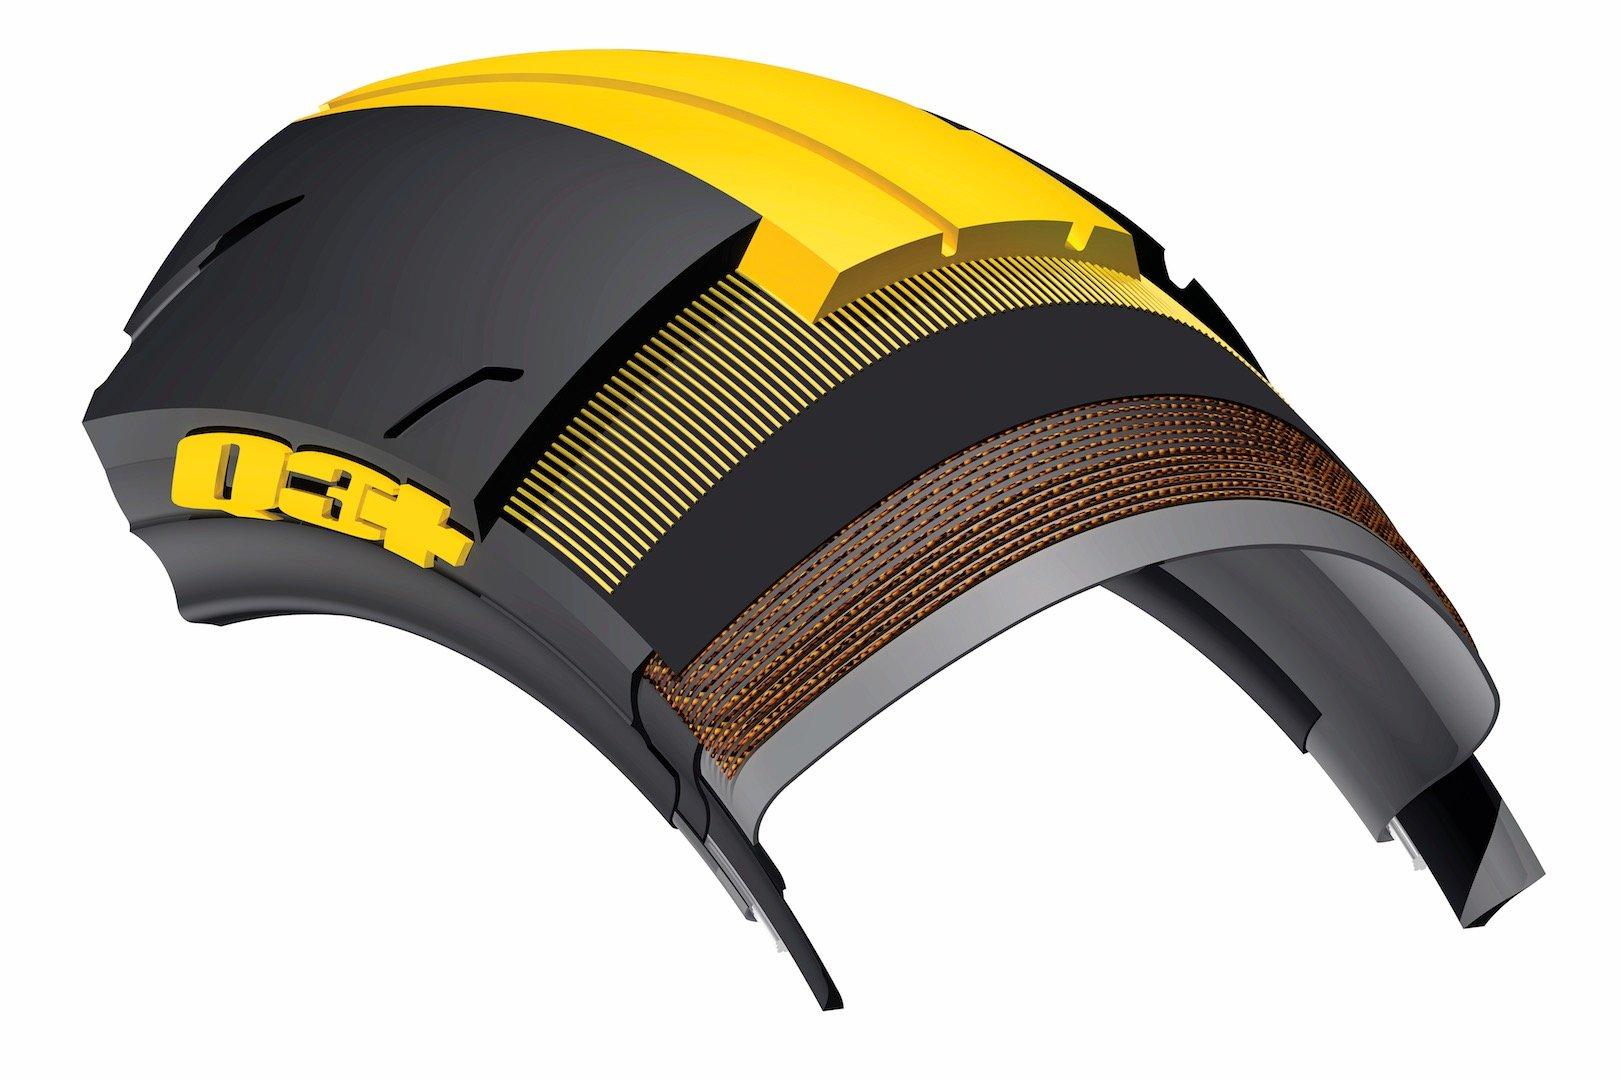 Dunlop Sportmax Q3+ rear construction